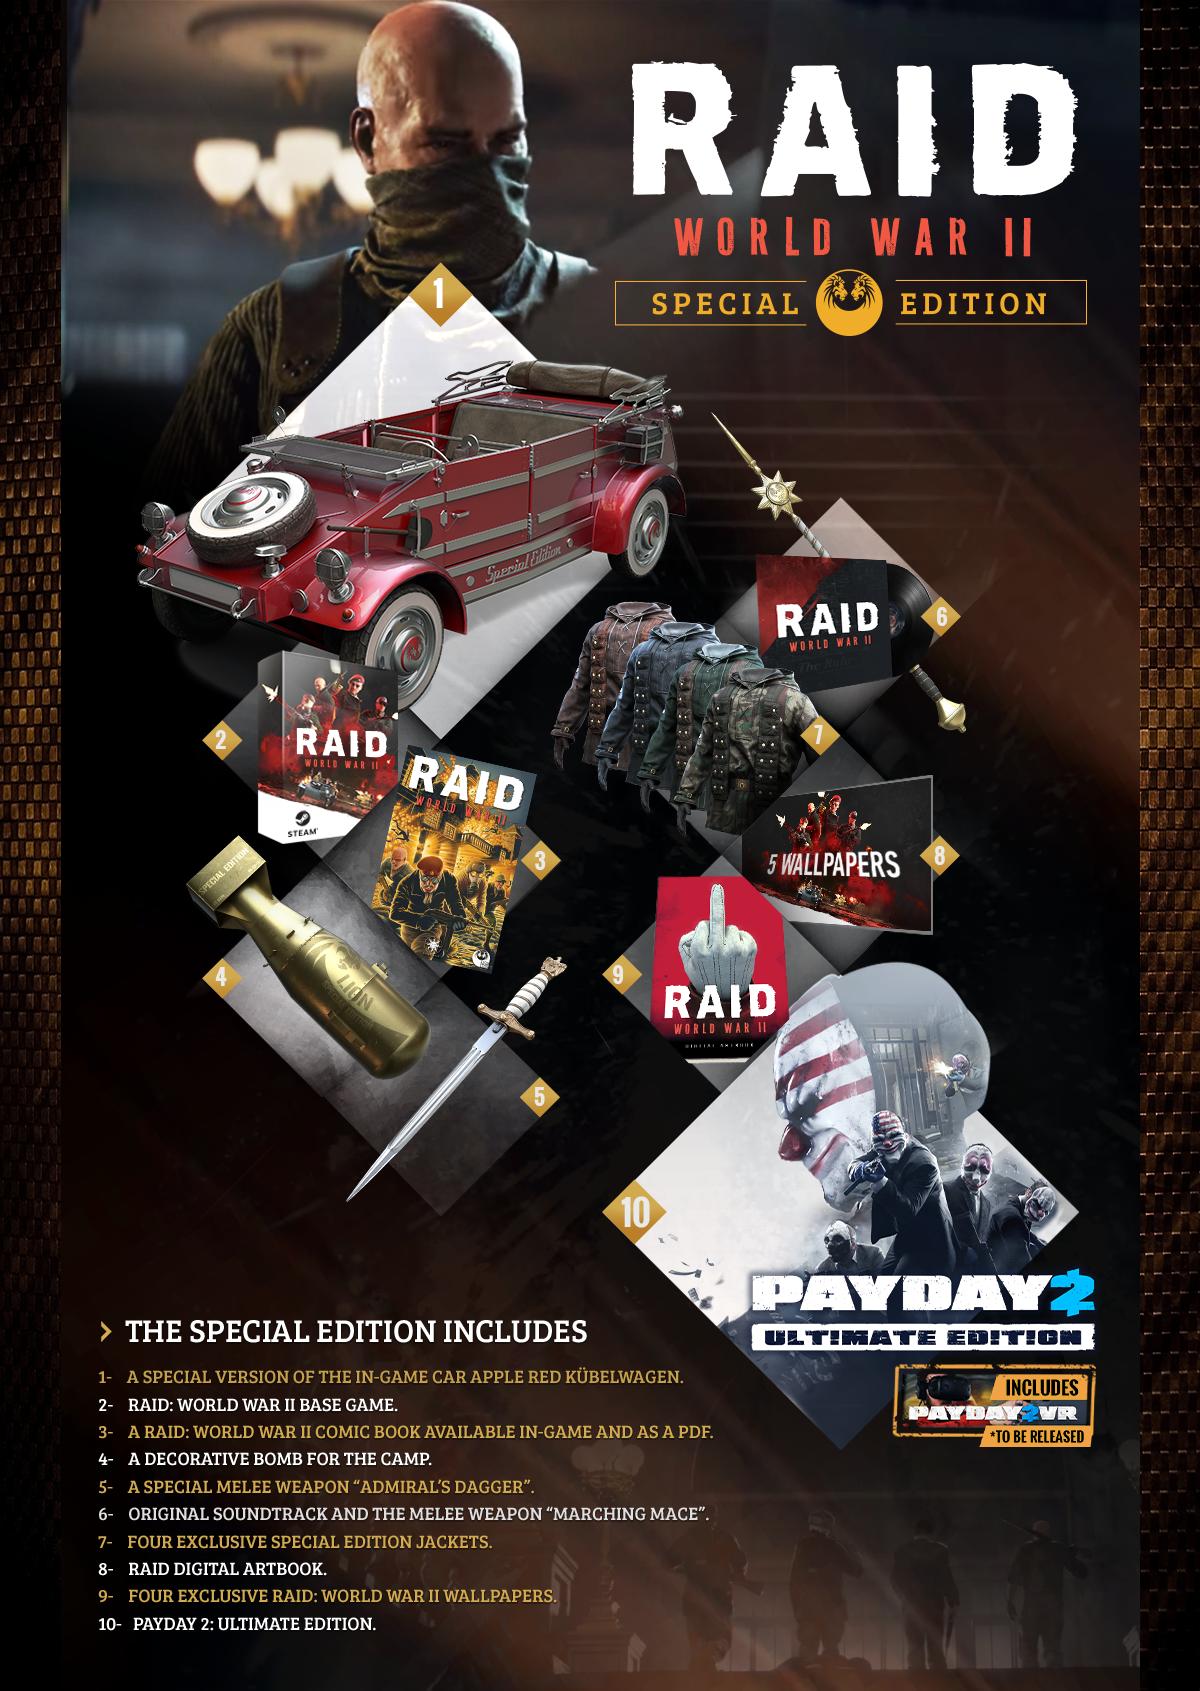 Raid Special Edition